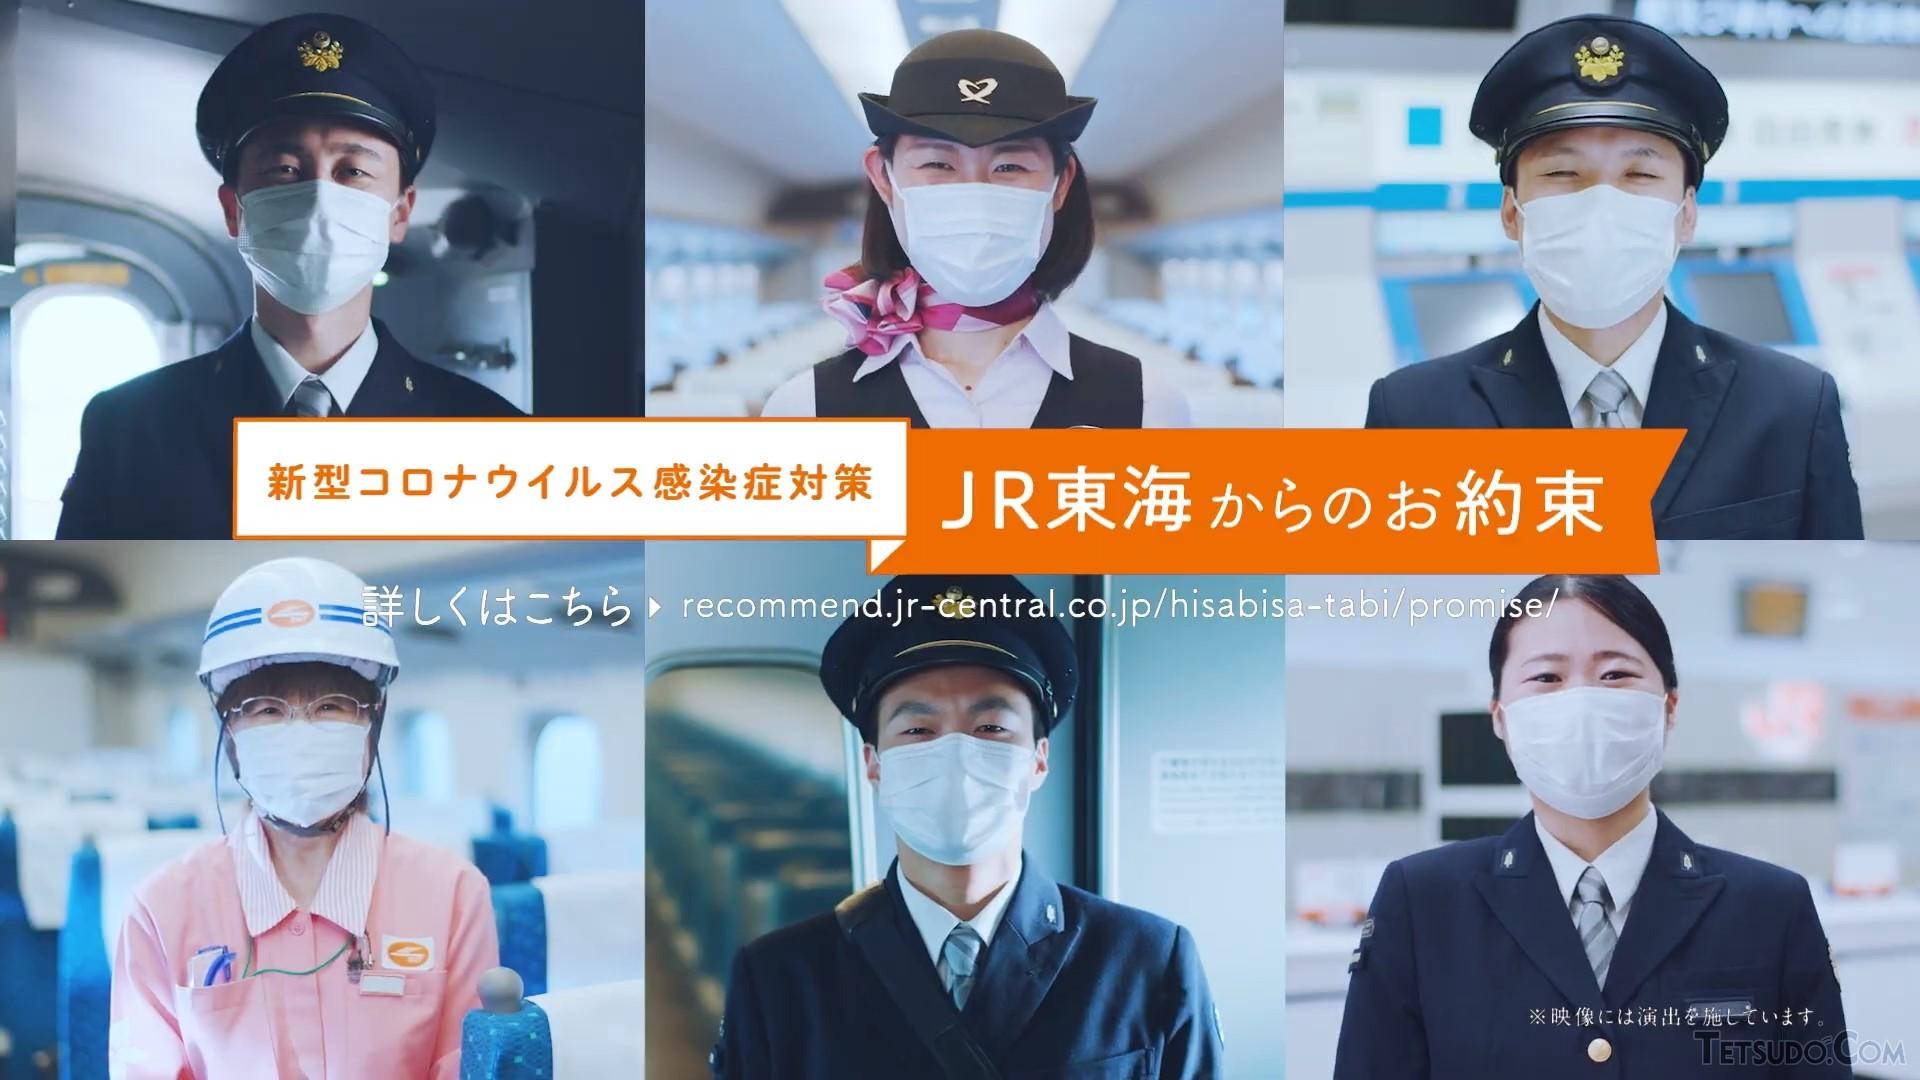 JR東海のPR動画「新型コロナウイルス感染症対策 JR東海からのお約束」